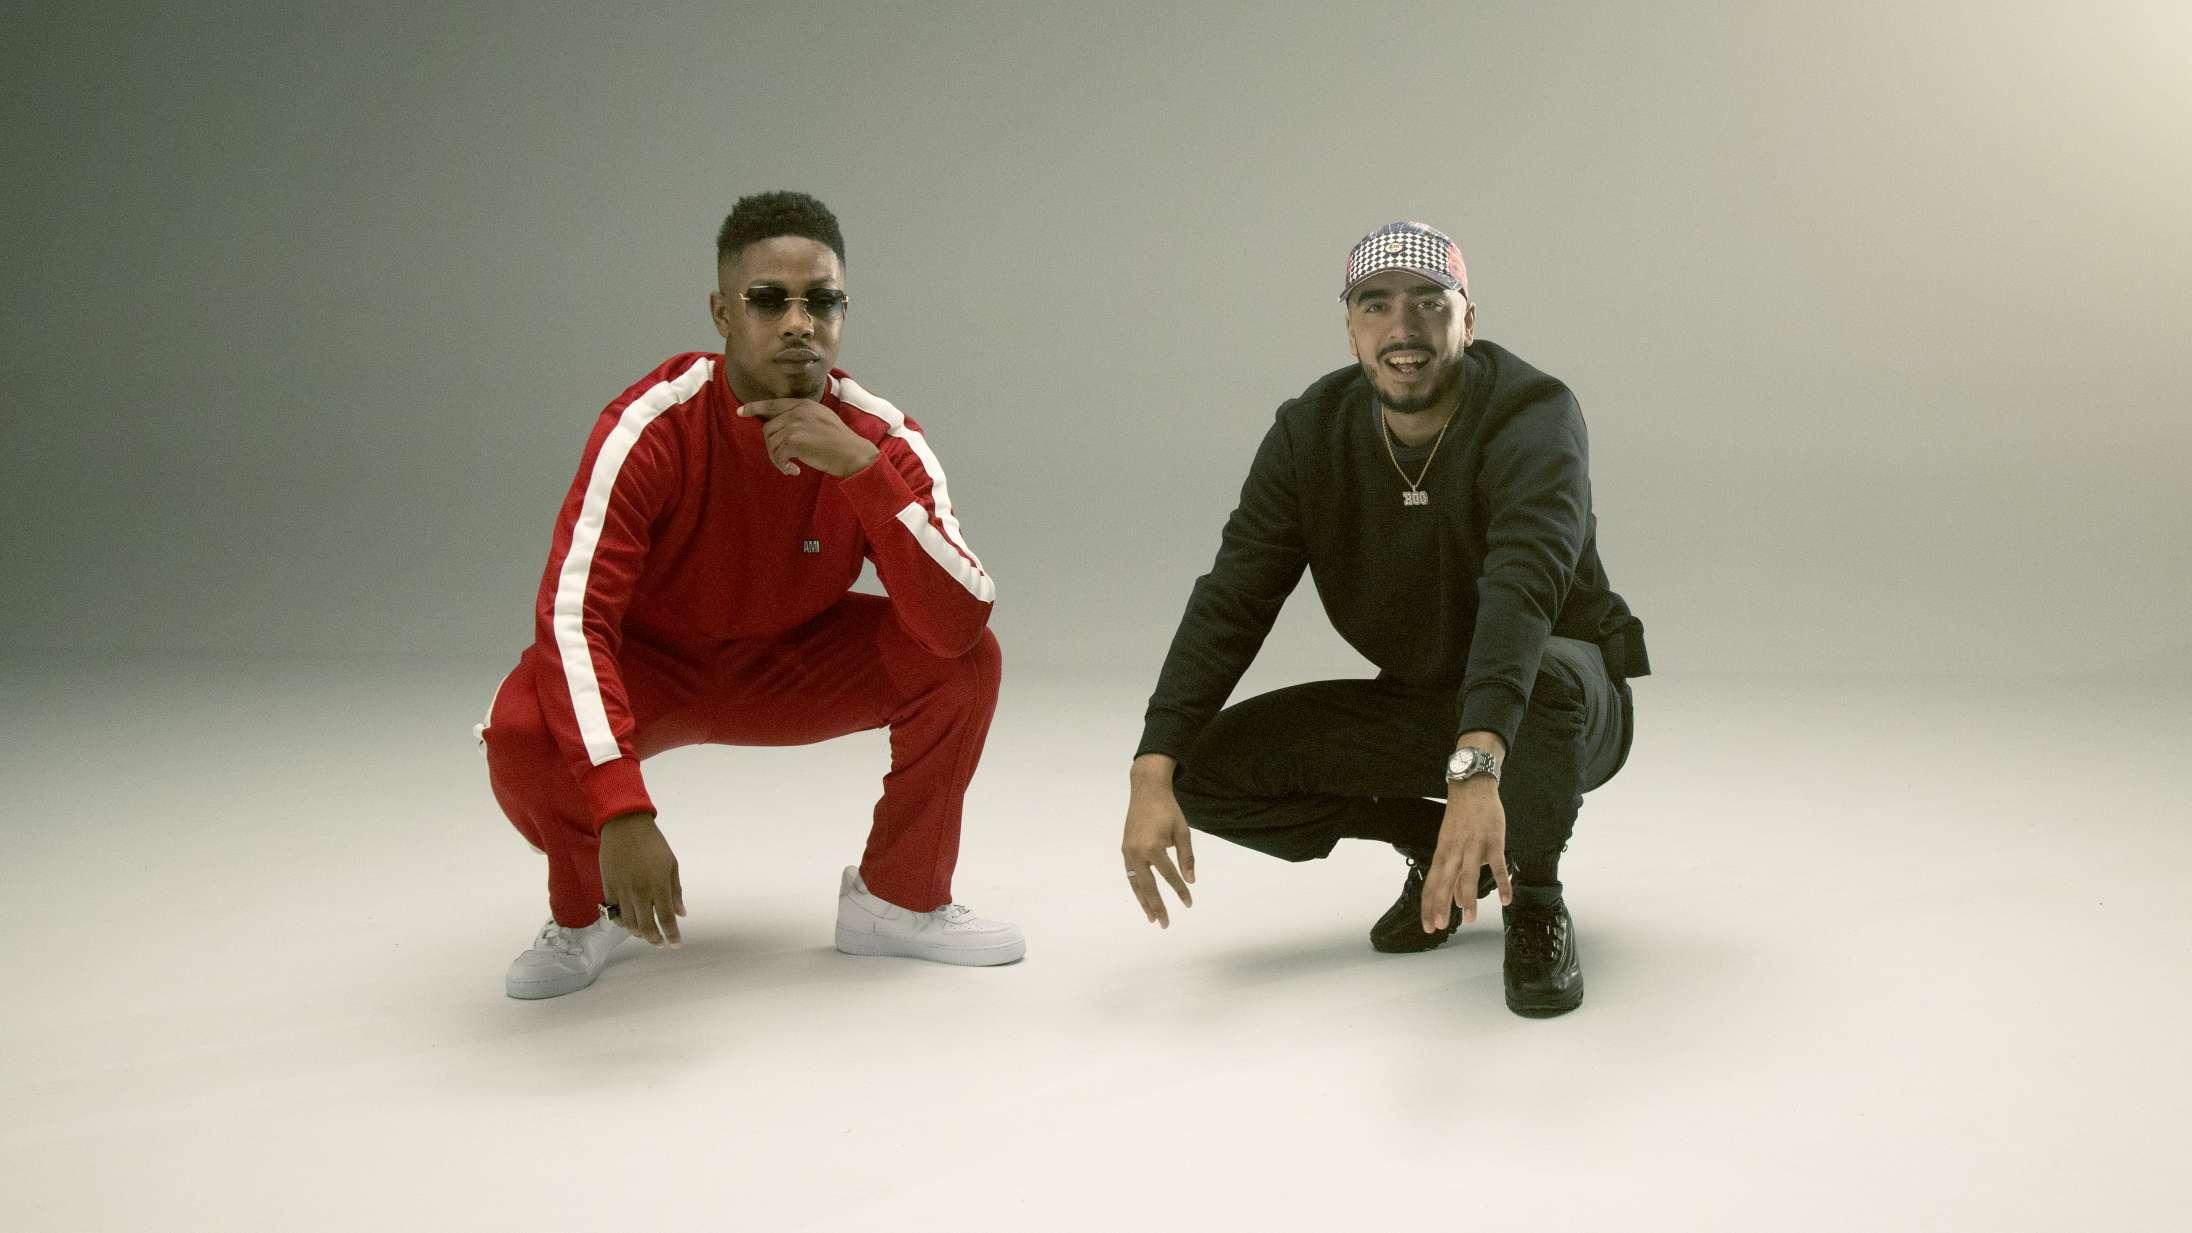 Kesi og Icekiid lyder som de danske Lil Baby og Gunna på ny single – hør 'Get the Bag'